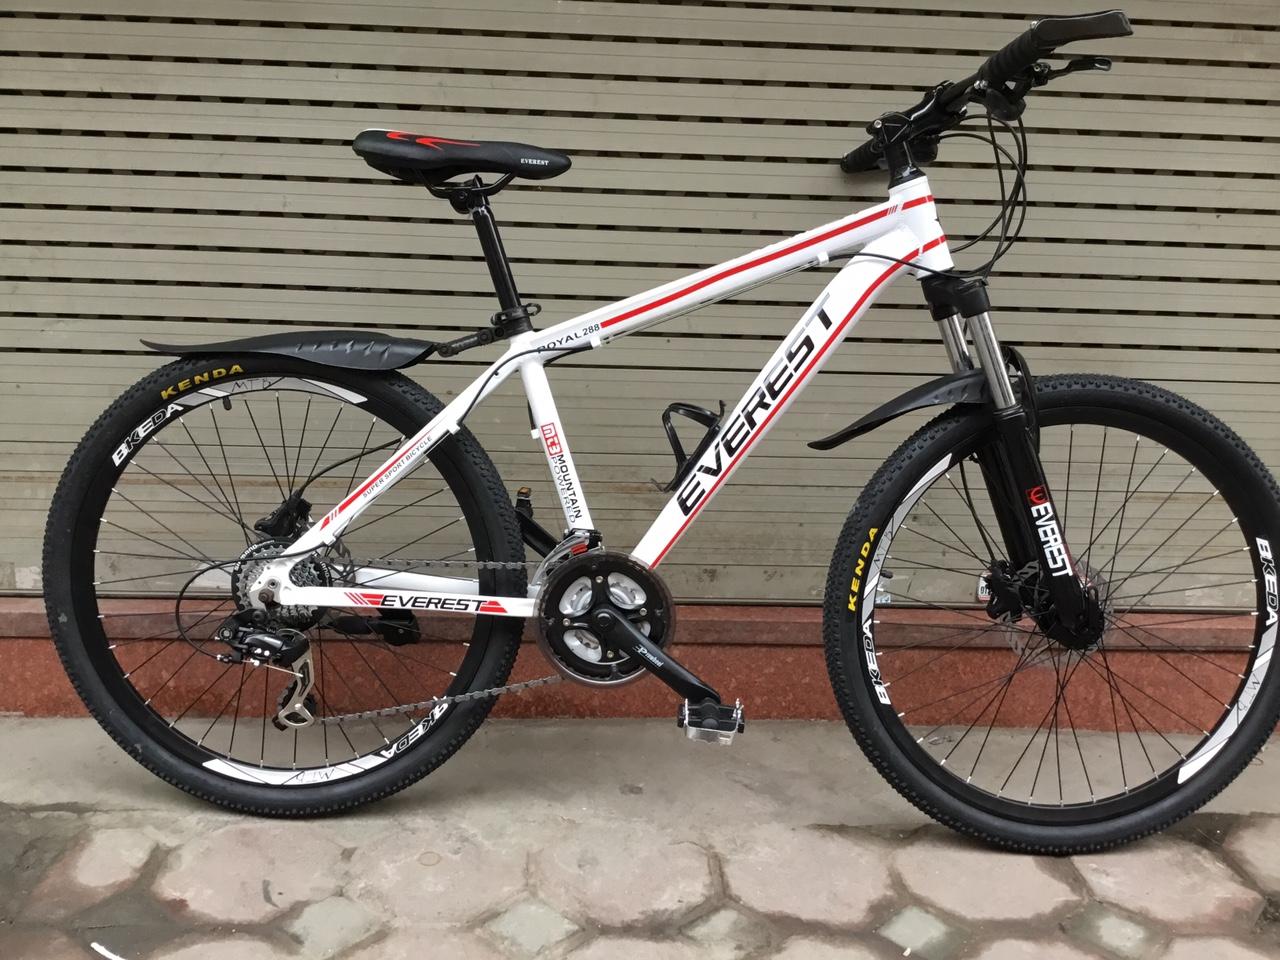 xe đạp thể thao EVEREST